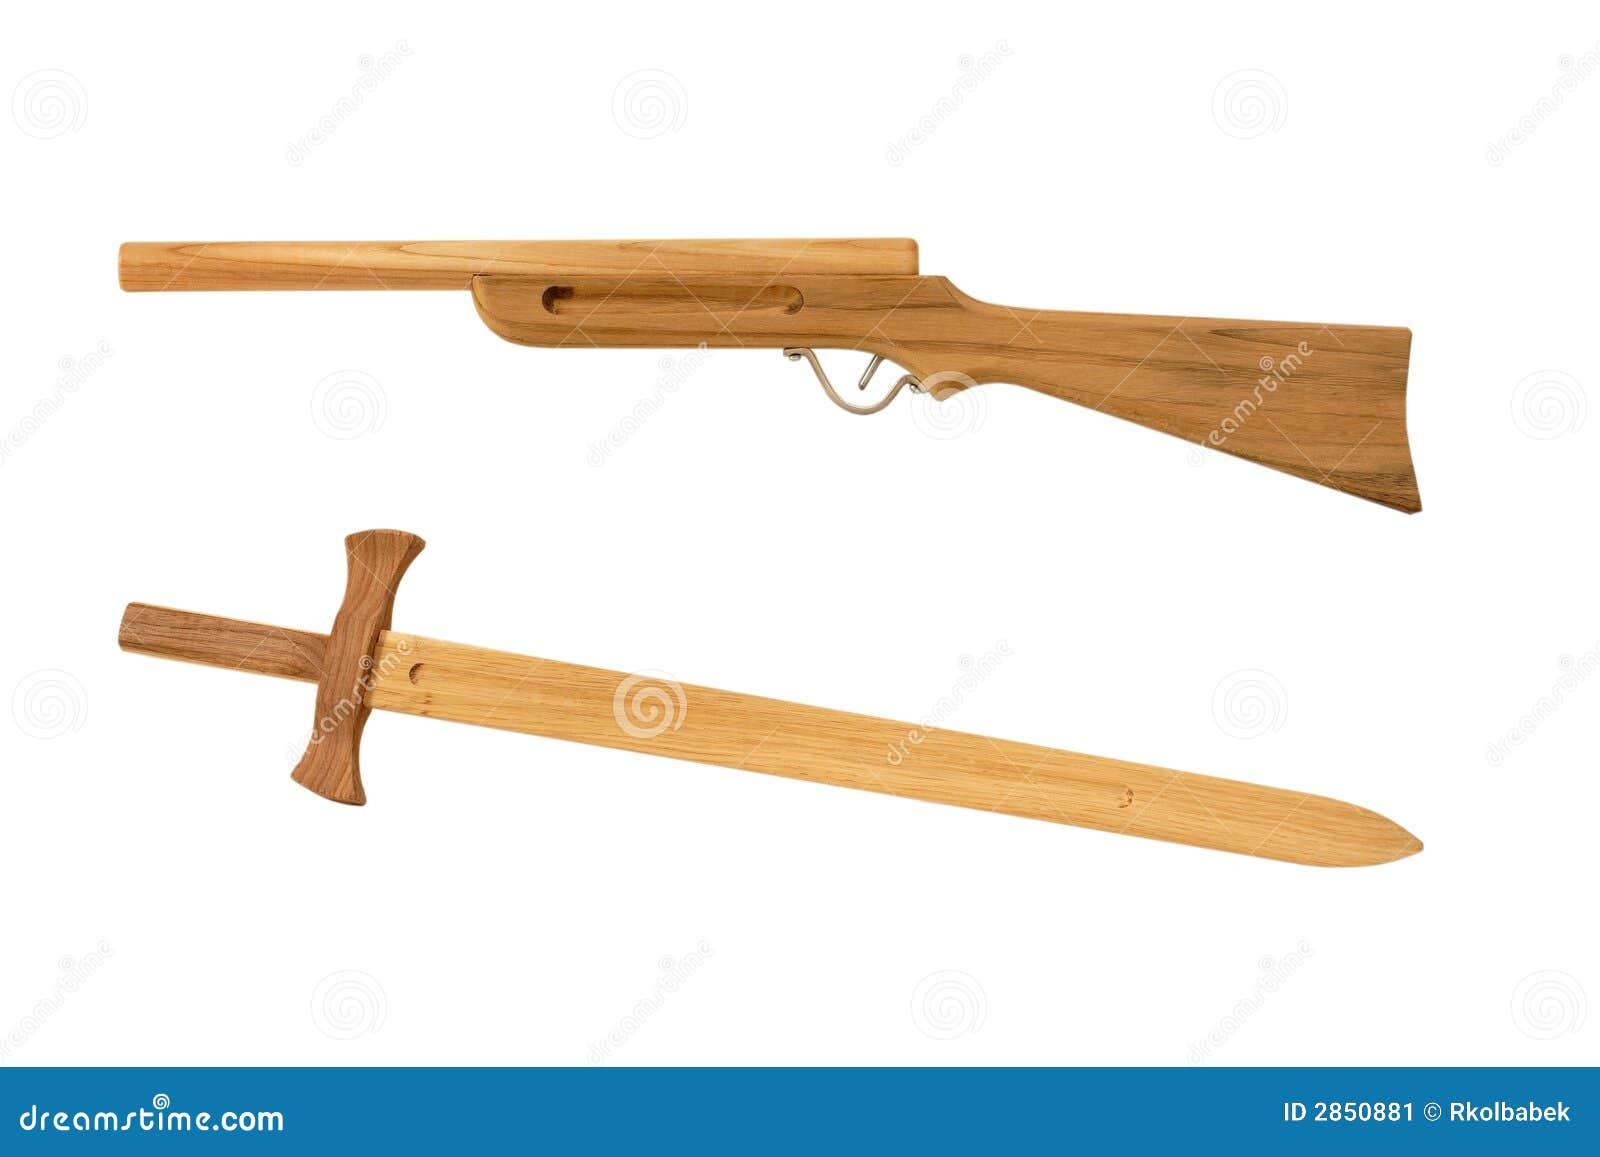 Juguete de madera imagen de archivo imagen 2850881 - Jugueteros de madera ...